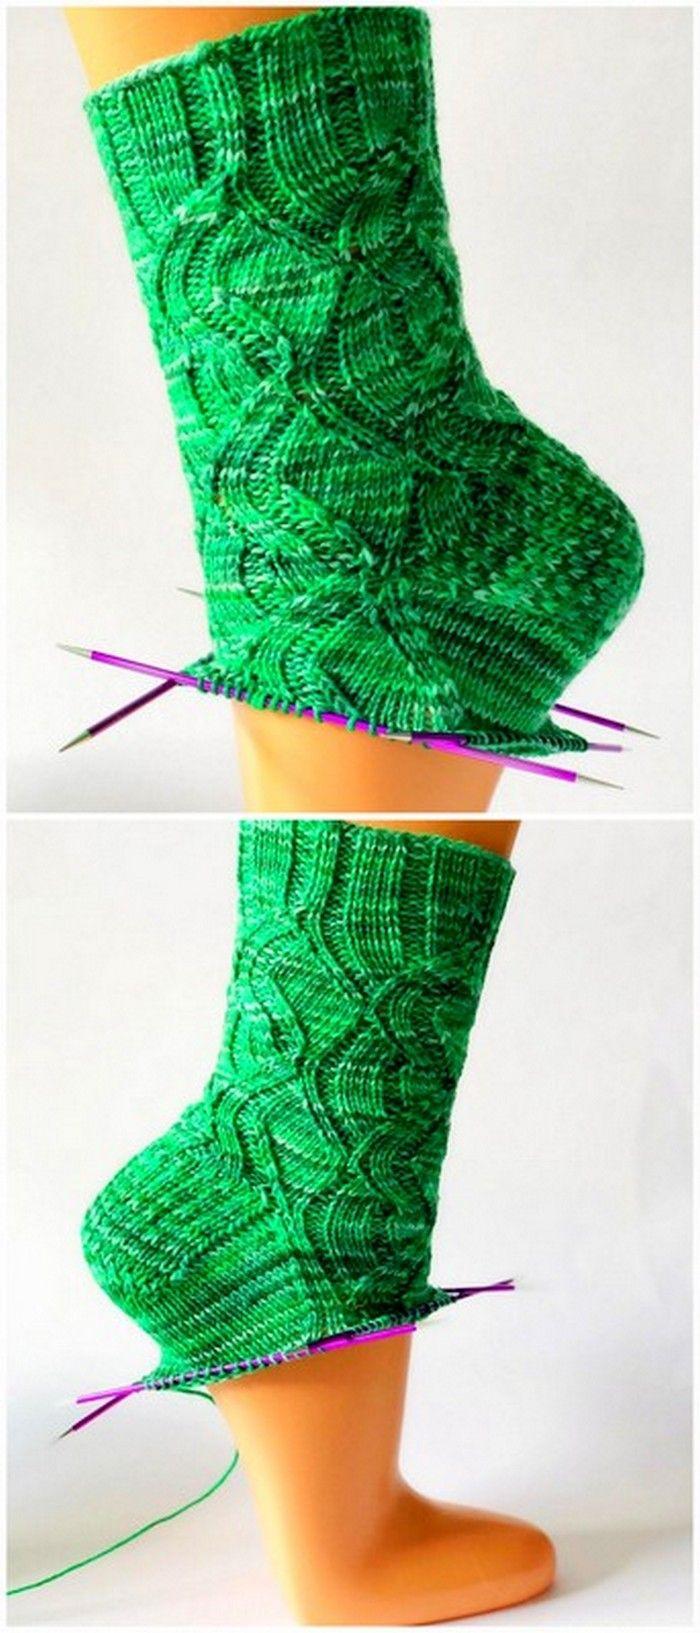 Unique Designs of Amazing Crochet Handbag & Accessories